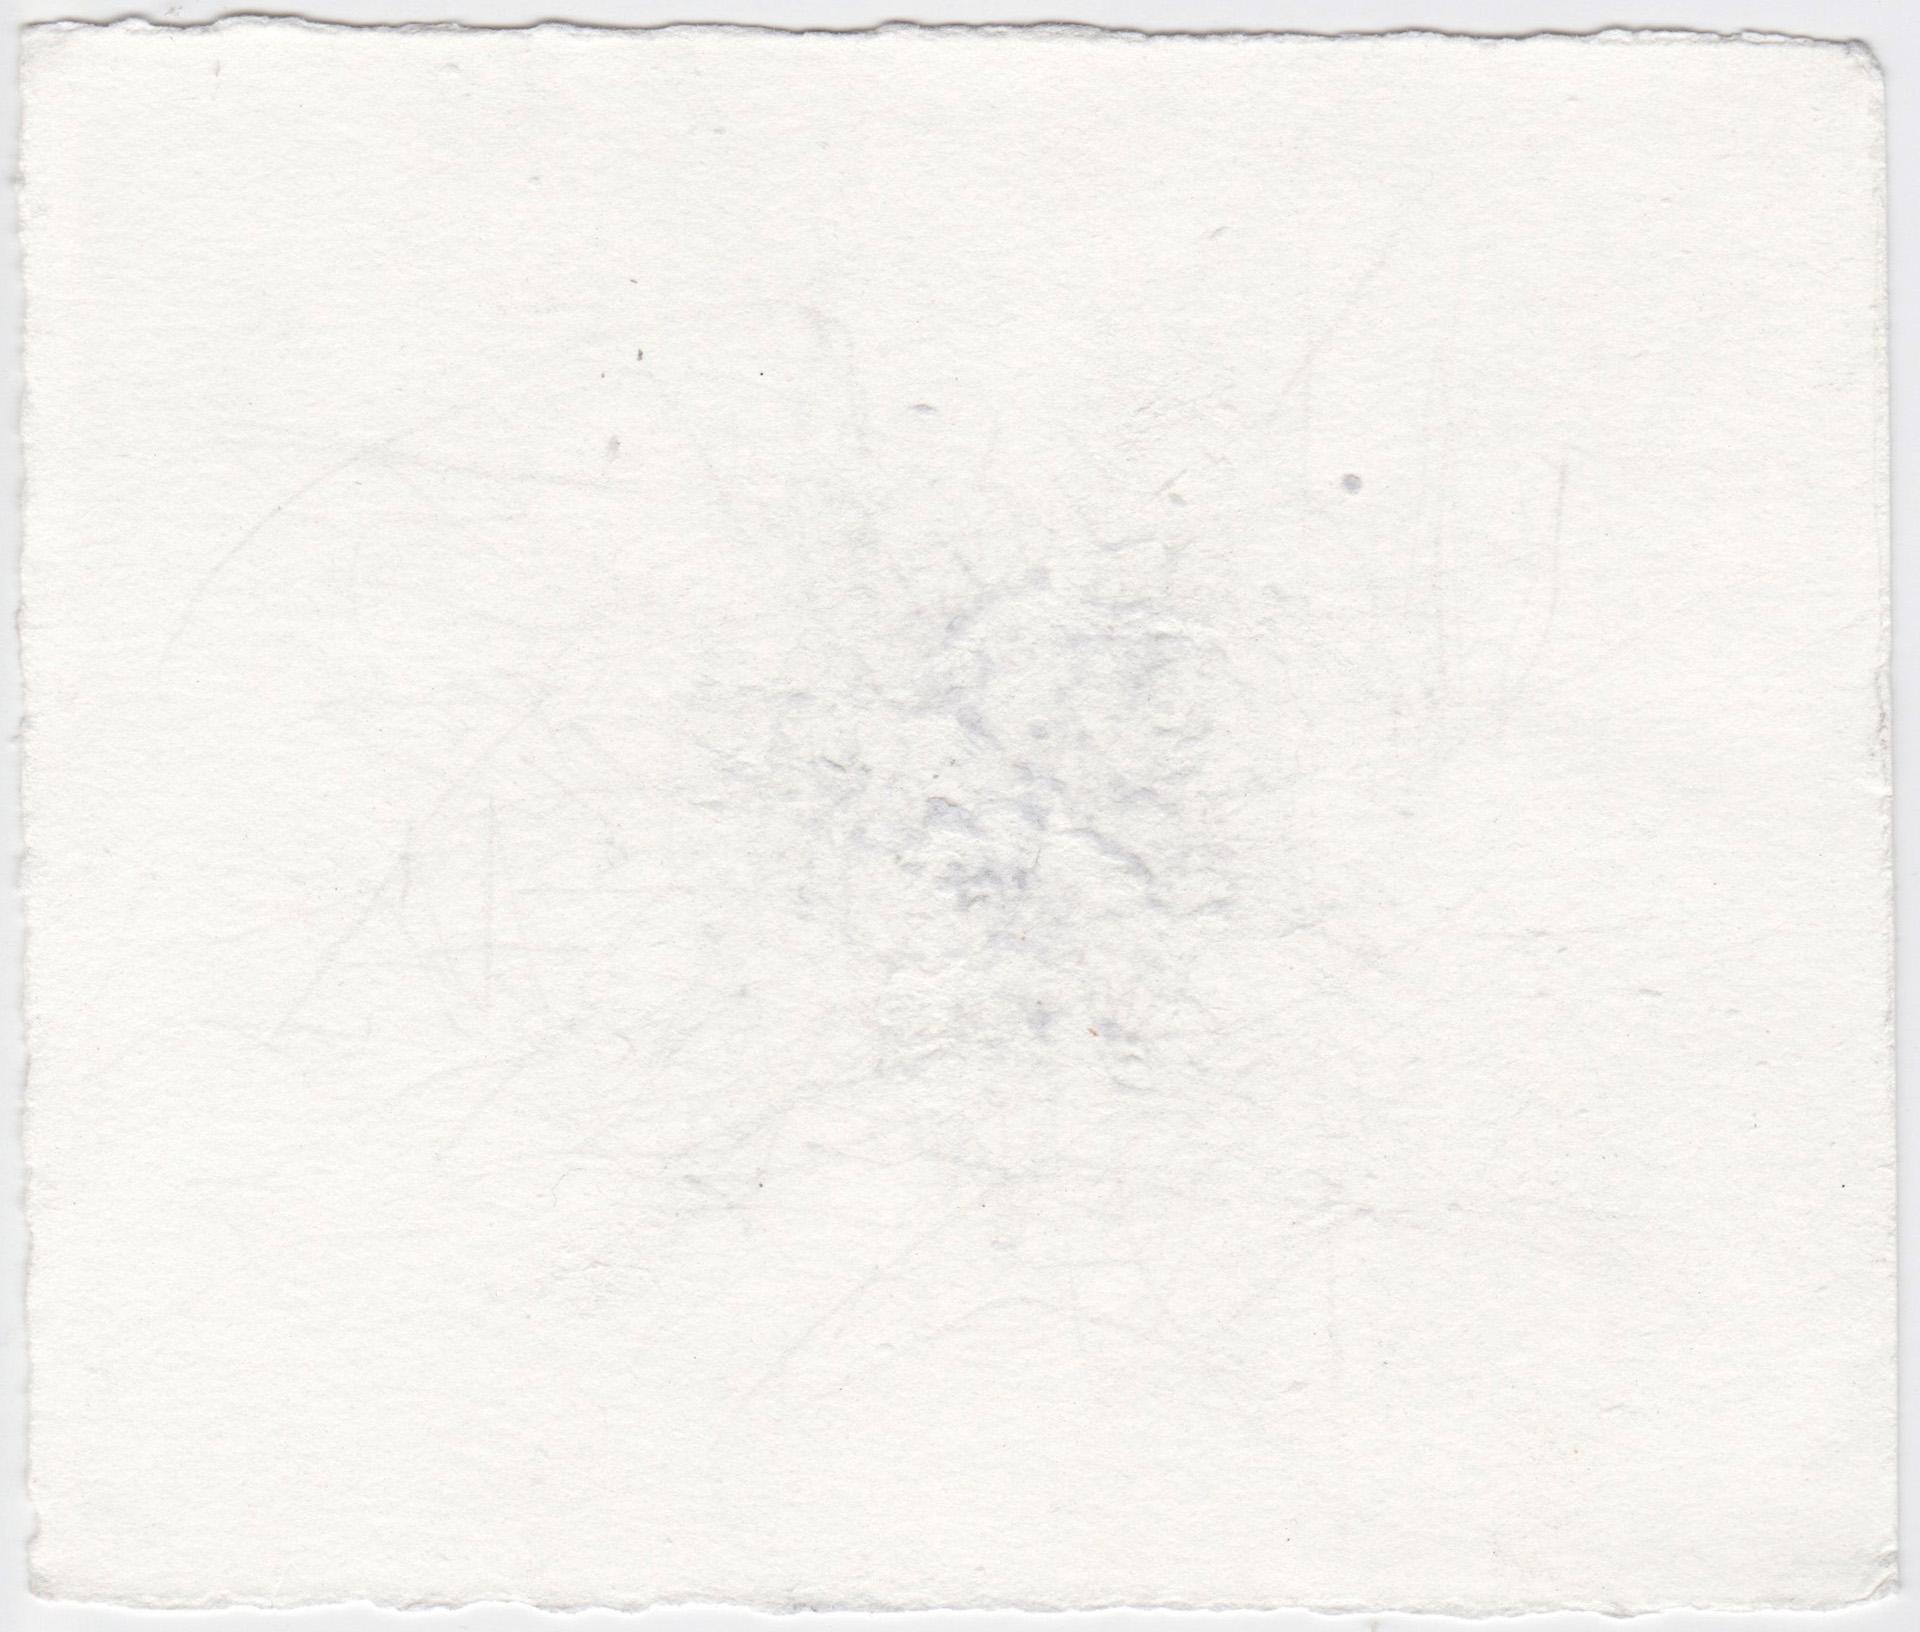 Ocean Drawing 004